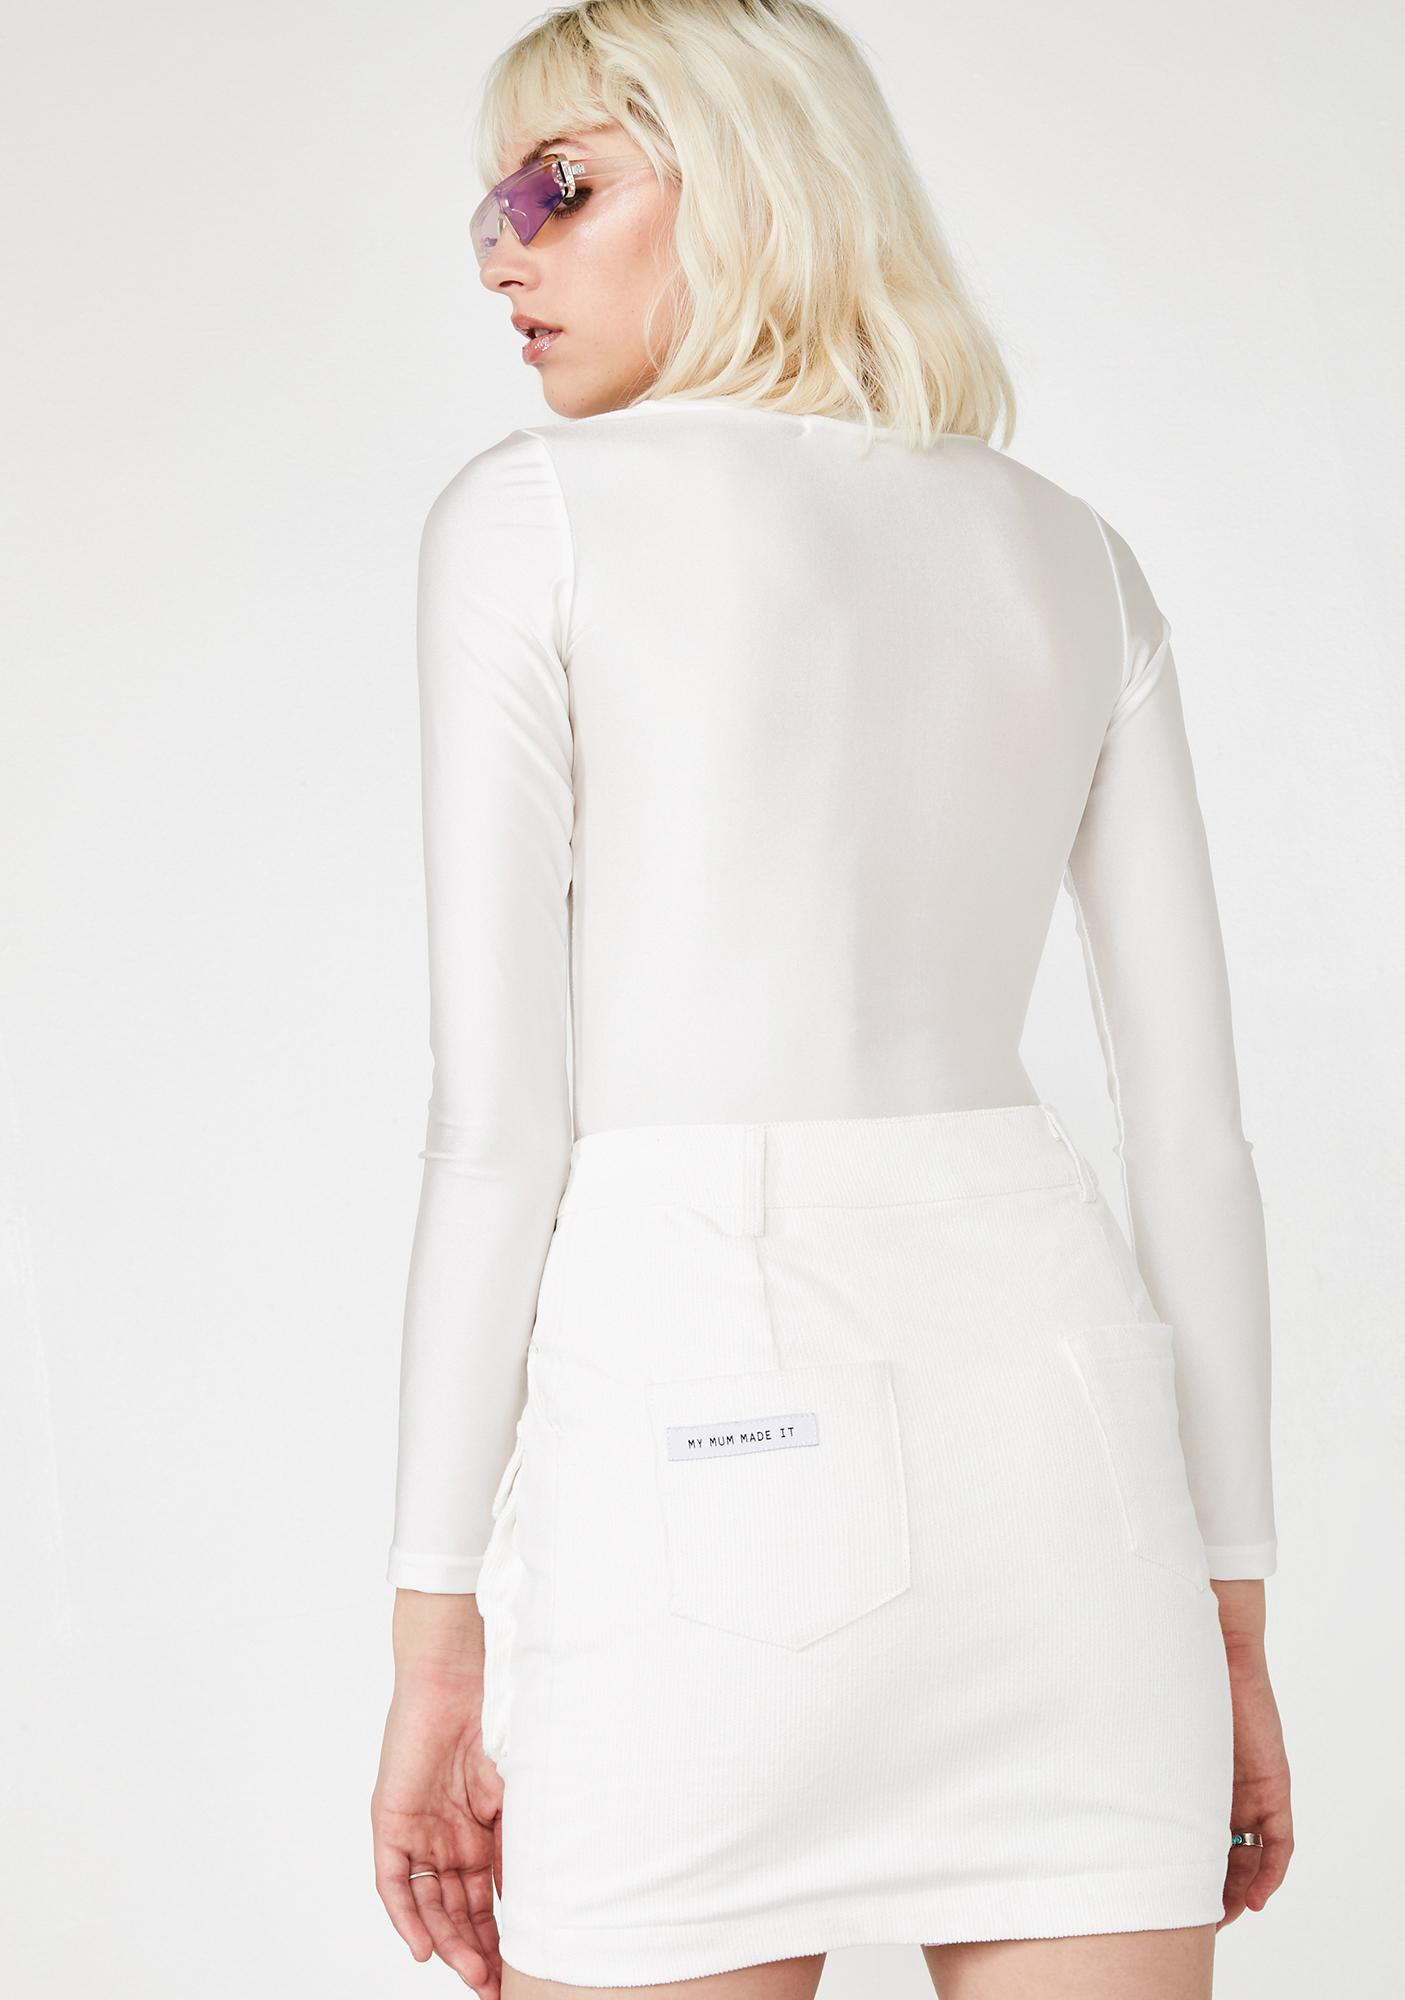 My Mum Made It Corduroy Snap Pocket Skirt